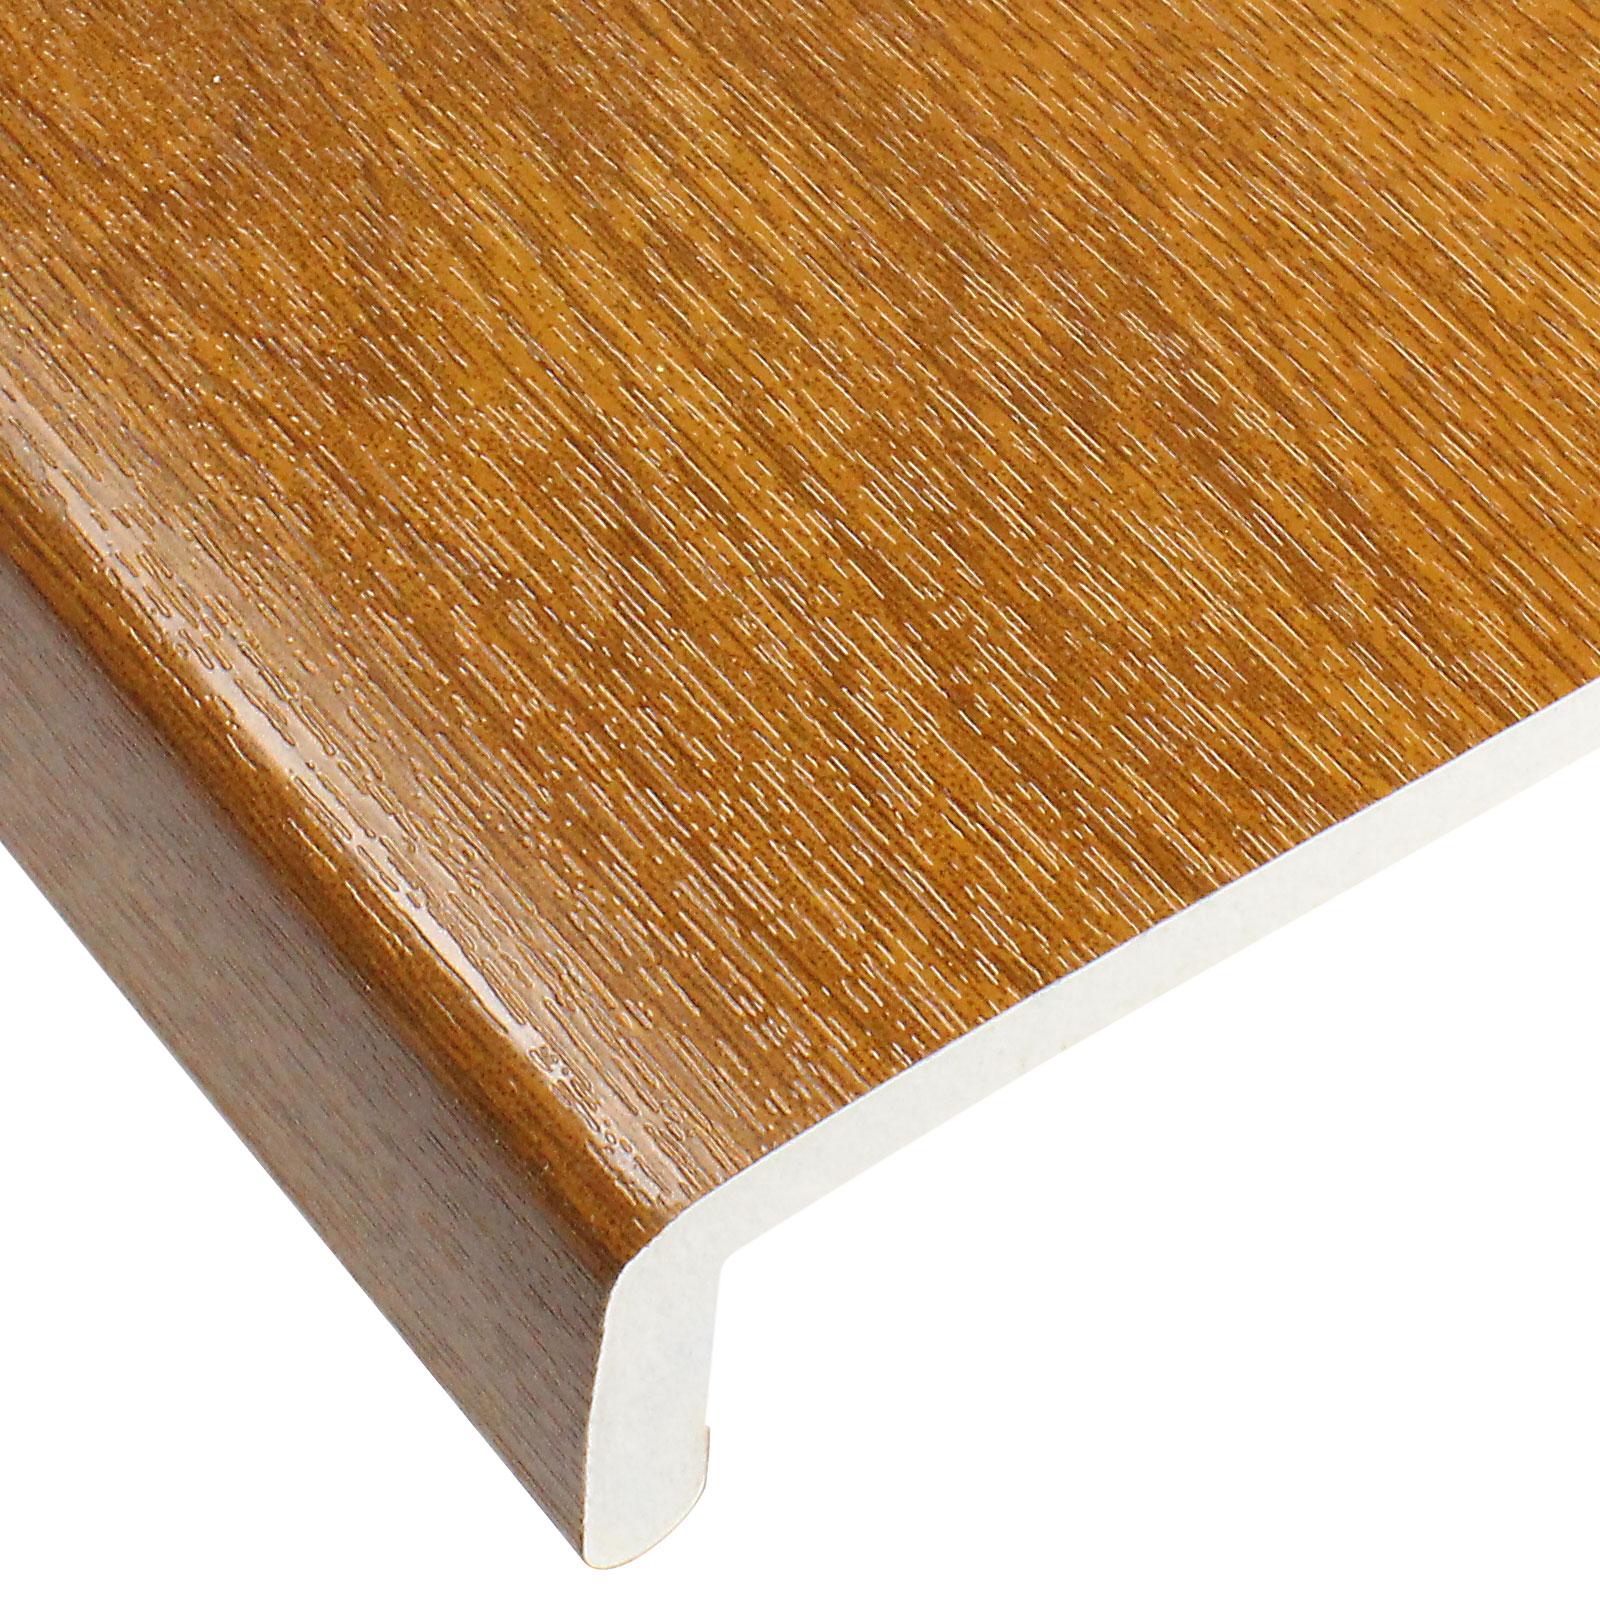 Window Board Cill Capping Cover 2 5m 225mm Golden Oak